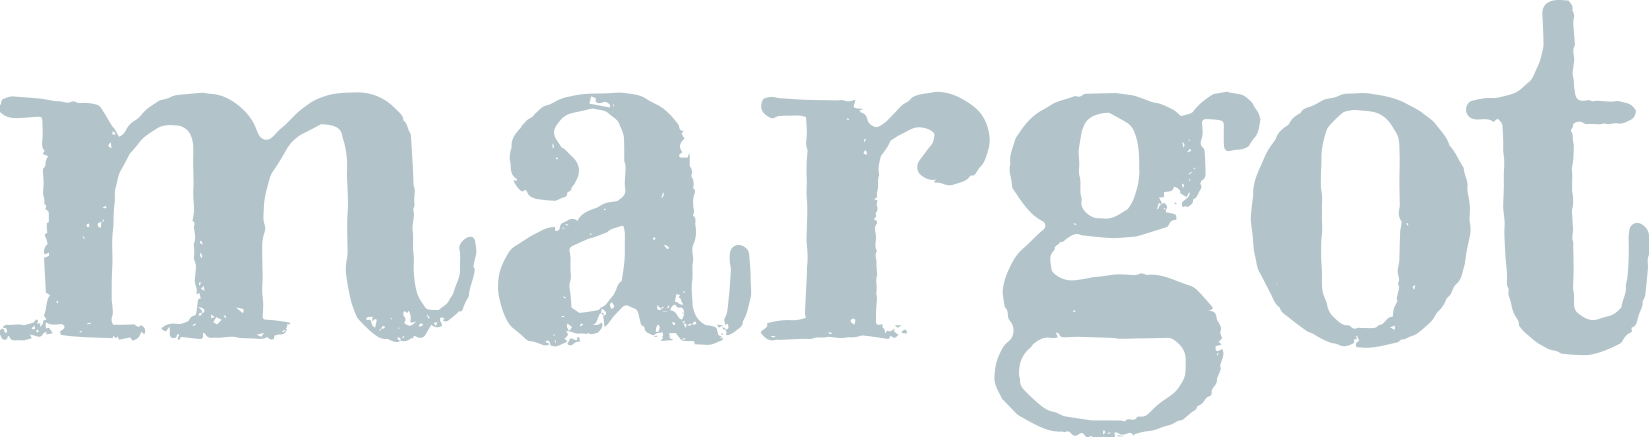 margot-blue-graphite-website-landing.png